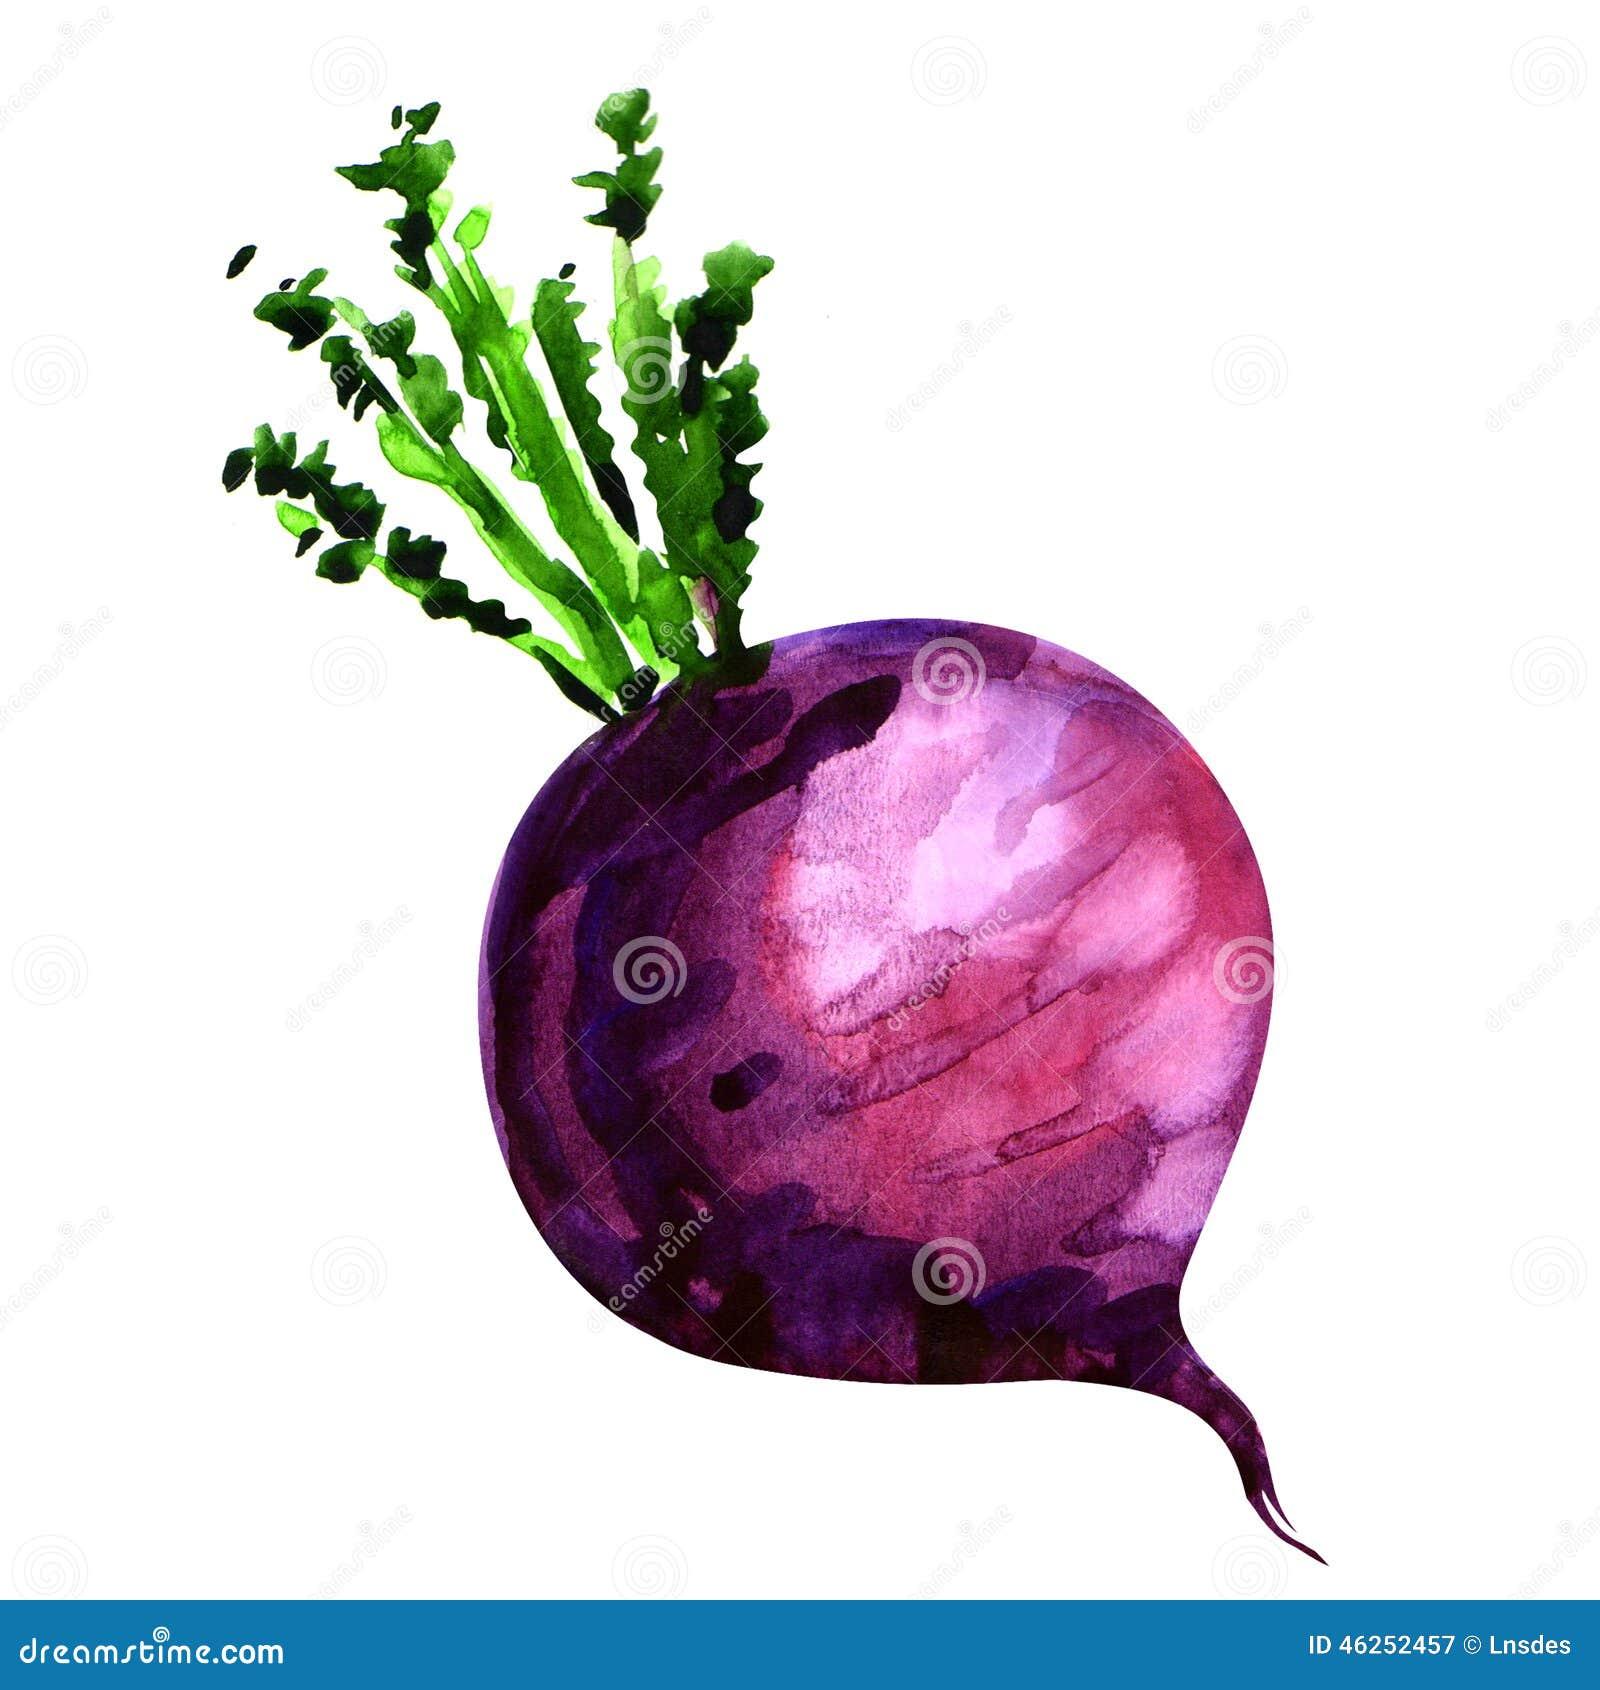 turnip stock illustrations 1 496 turnip stock illustrations rh dreamstime com turnip clipart images tulip outline clip art